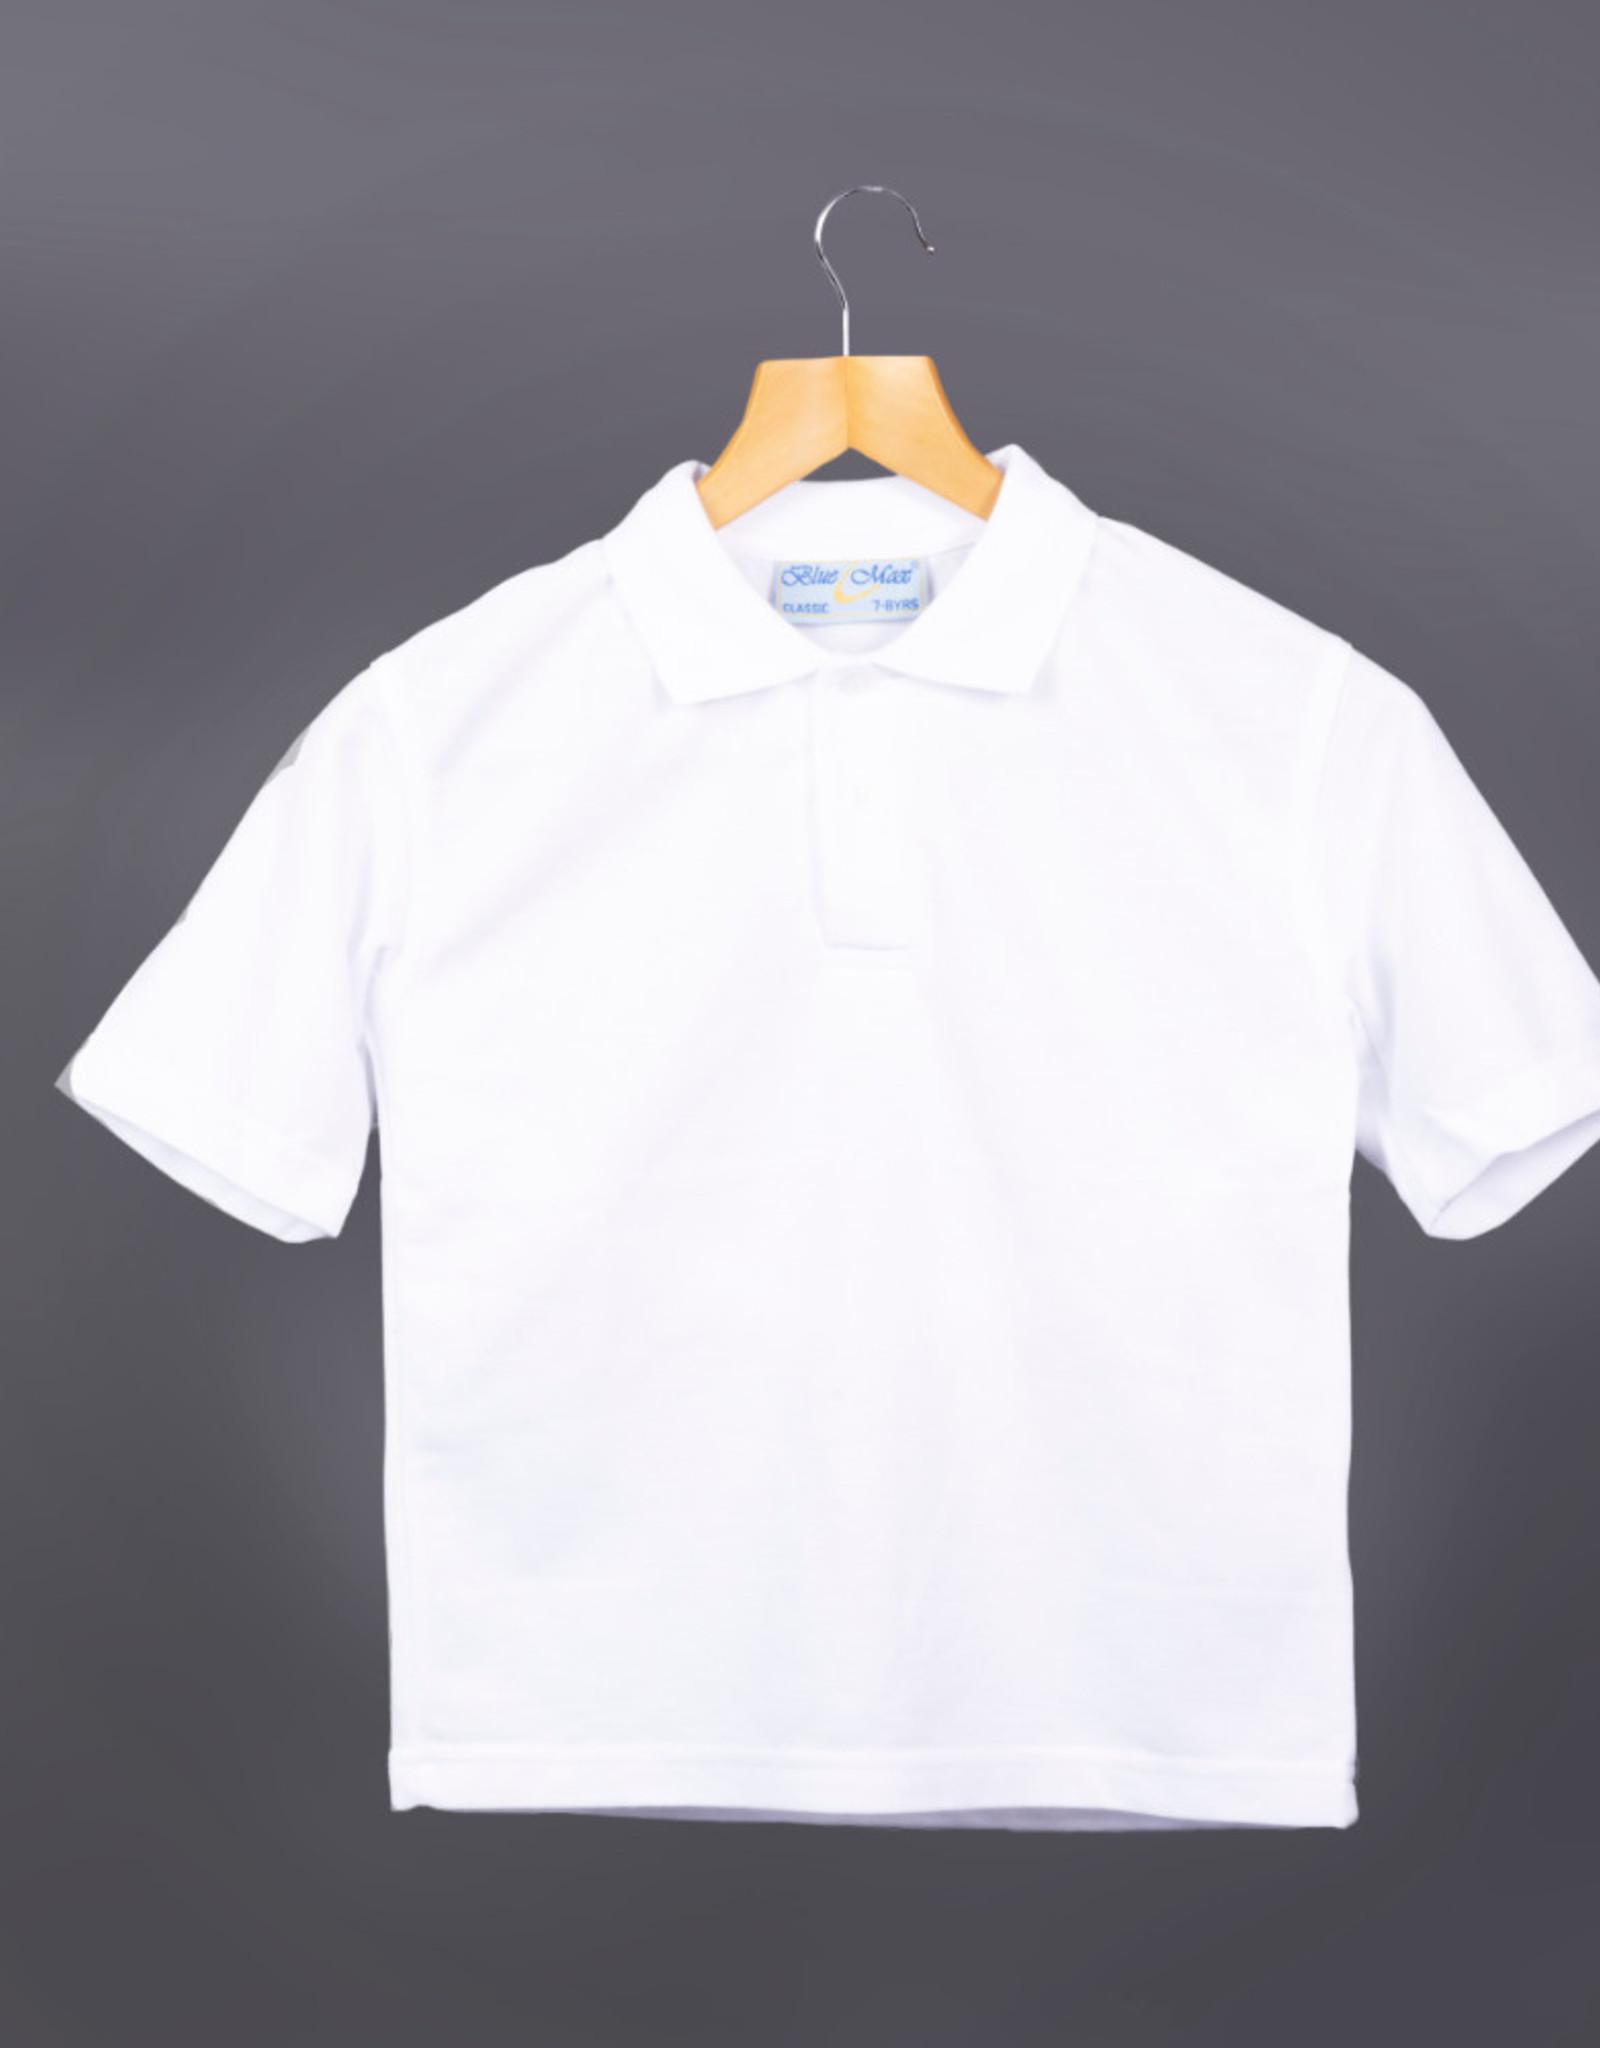 Polo-Shirt Adult Size - All Saints